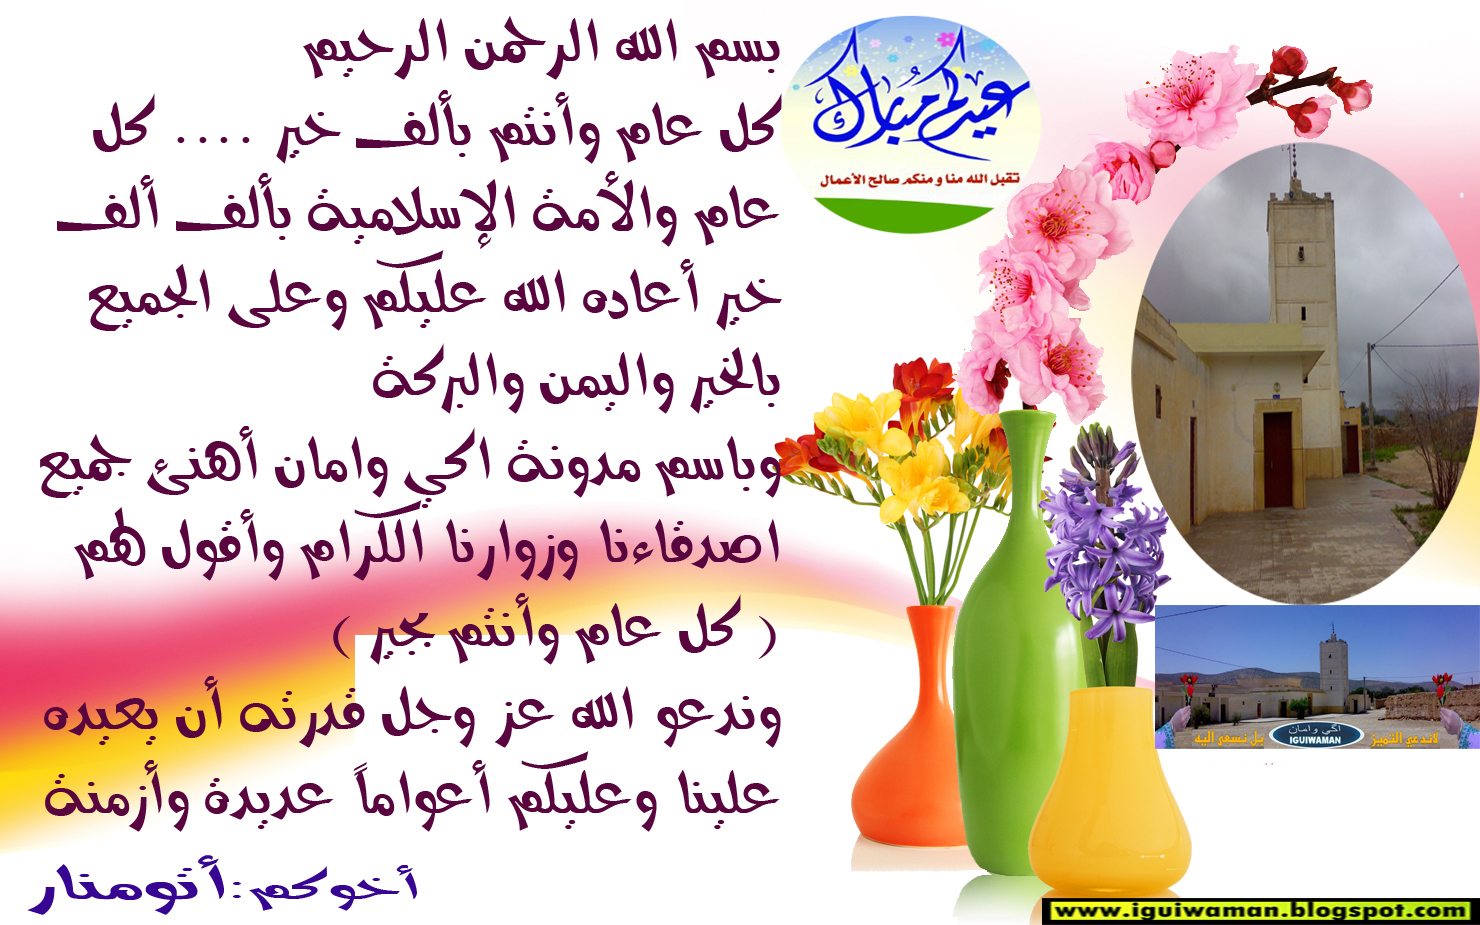 إگـــي وامــان عيد مبارك سعيد